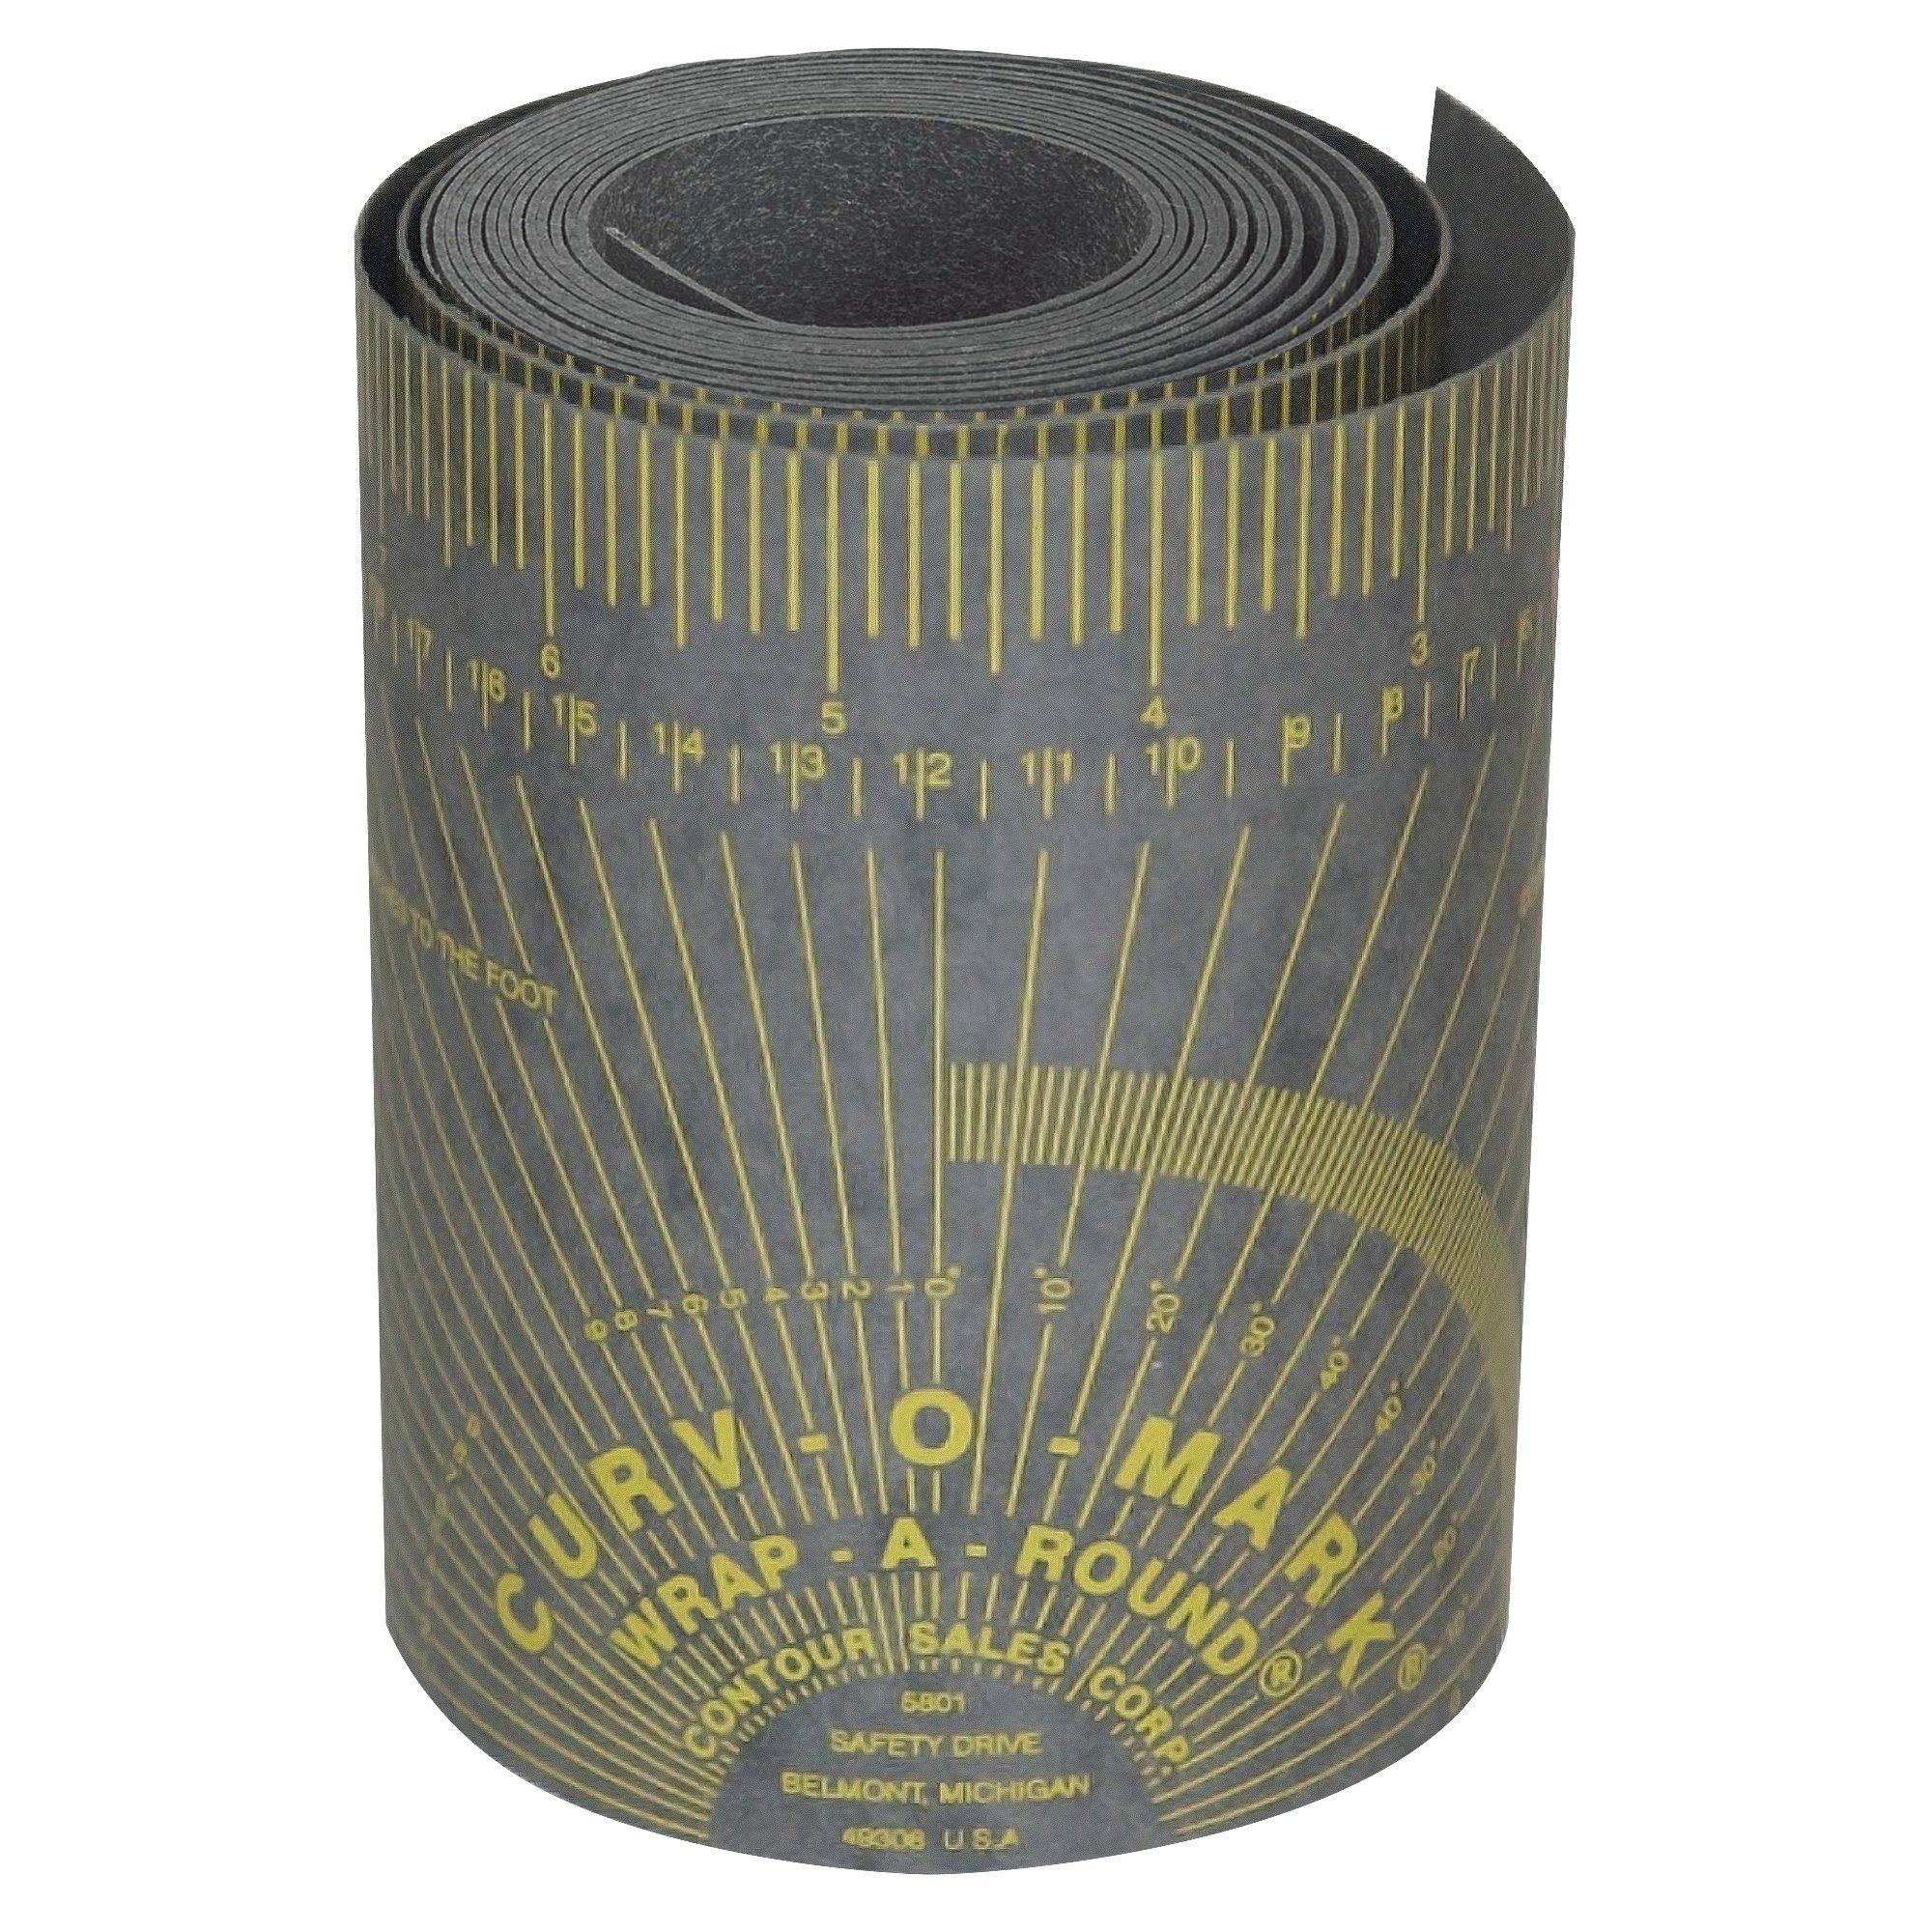 "Jackson Safety Contour Wrap-A-Round Pipe Marking Tool (14767), Gray, XX-Large, 5"" to 9', 1 / Case"